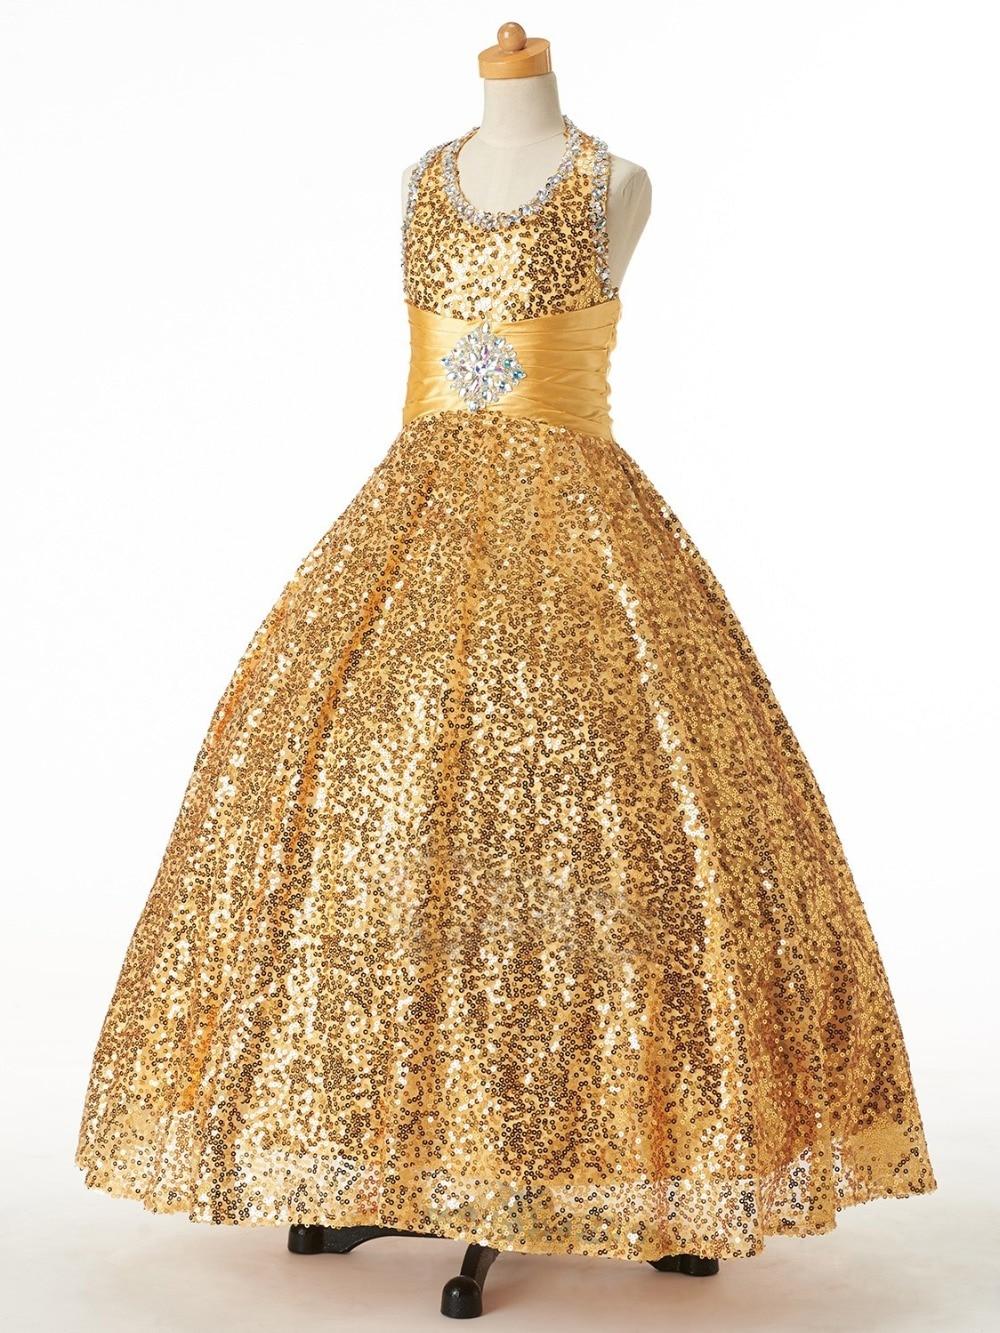 Bright Gold Sequins Halter Beads Flower Girl Dresses Princess